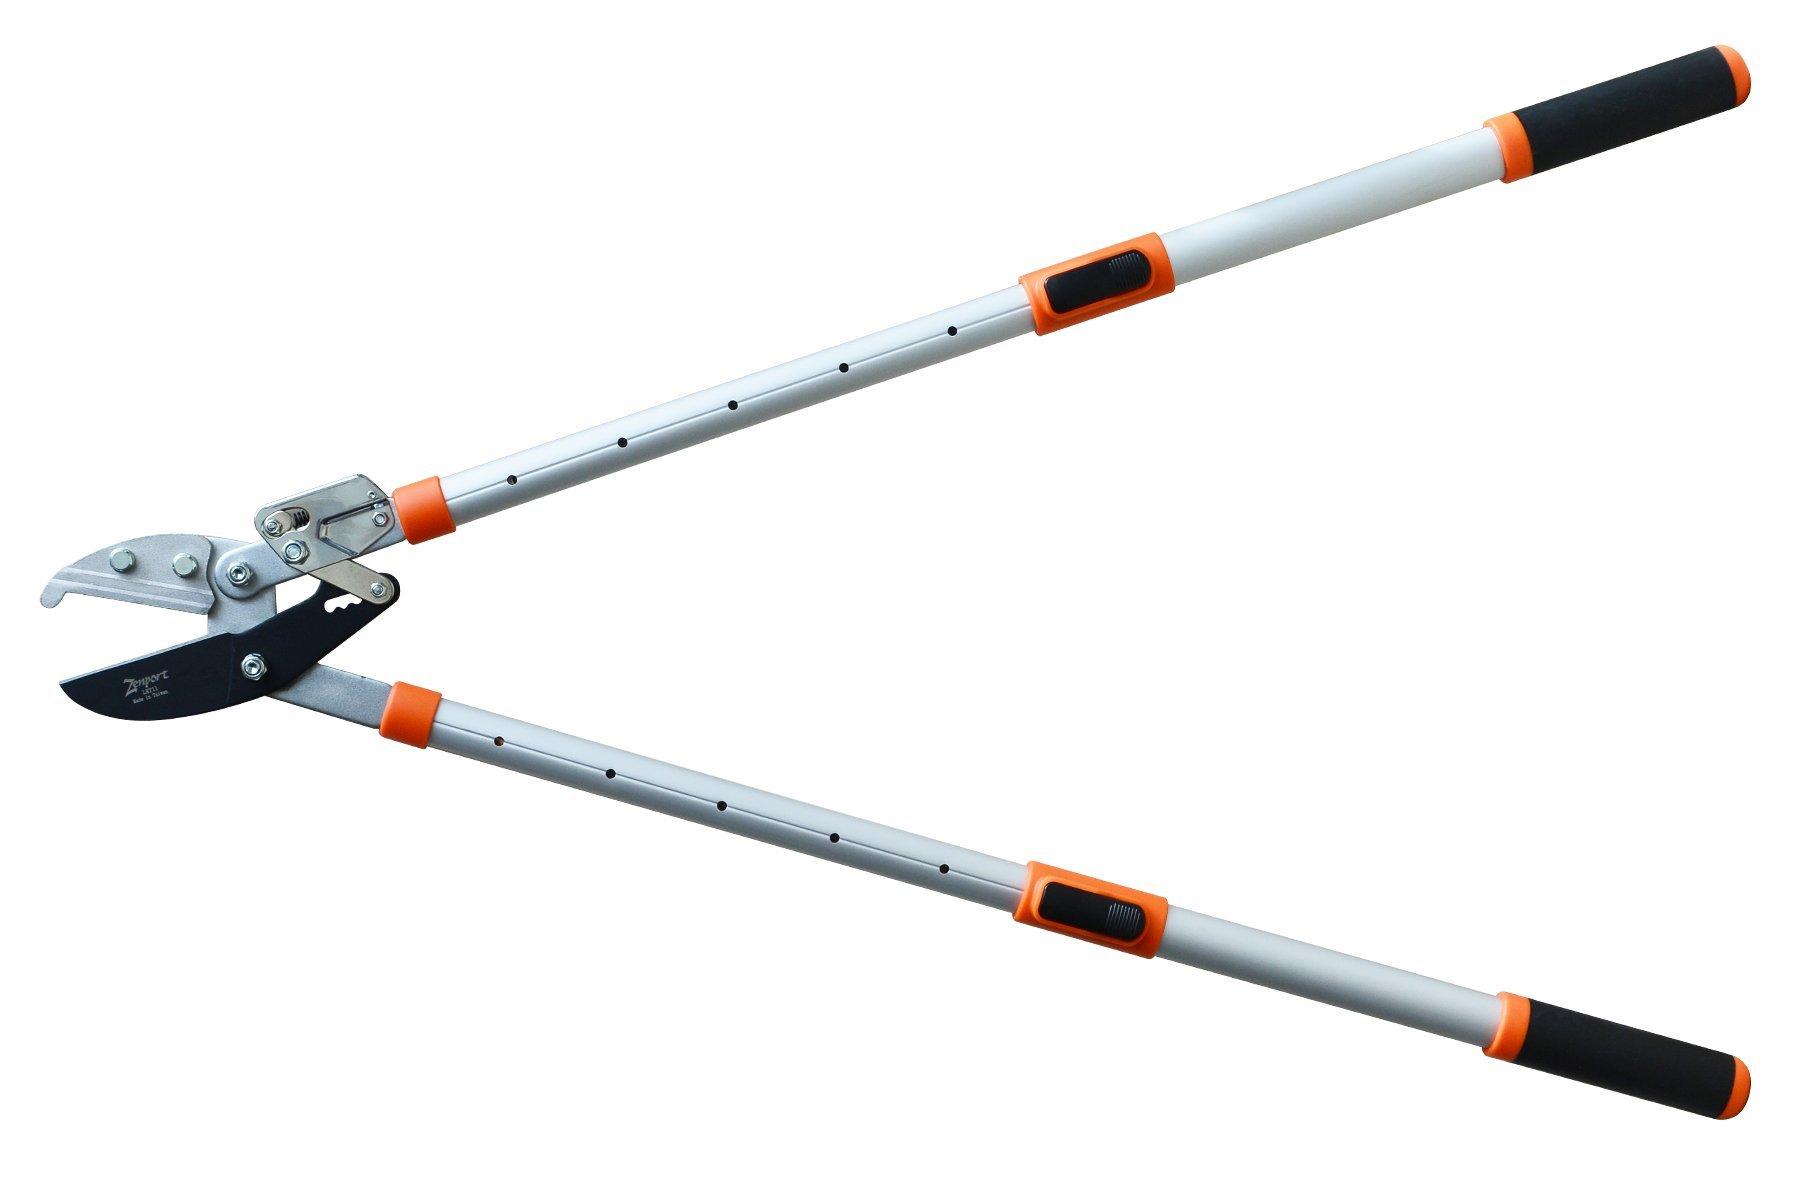 Zenport LRT11 Telescopic Ratchet Anvil Lopper, 23.5-Inch to 35.8-Inch